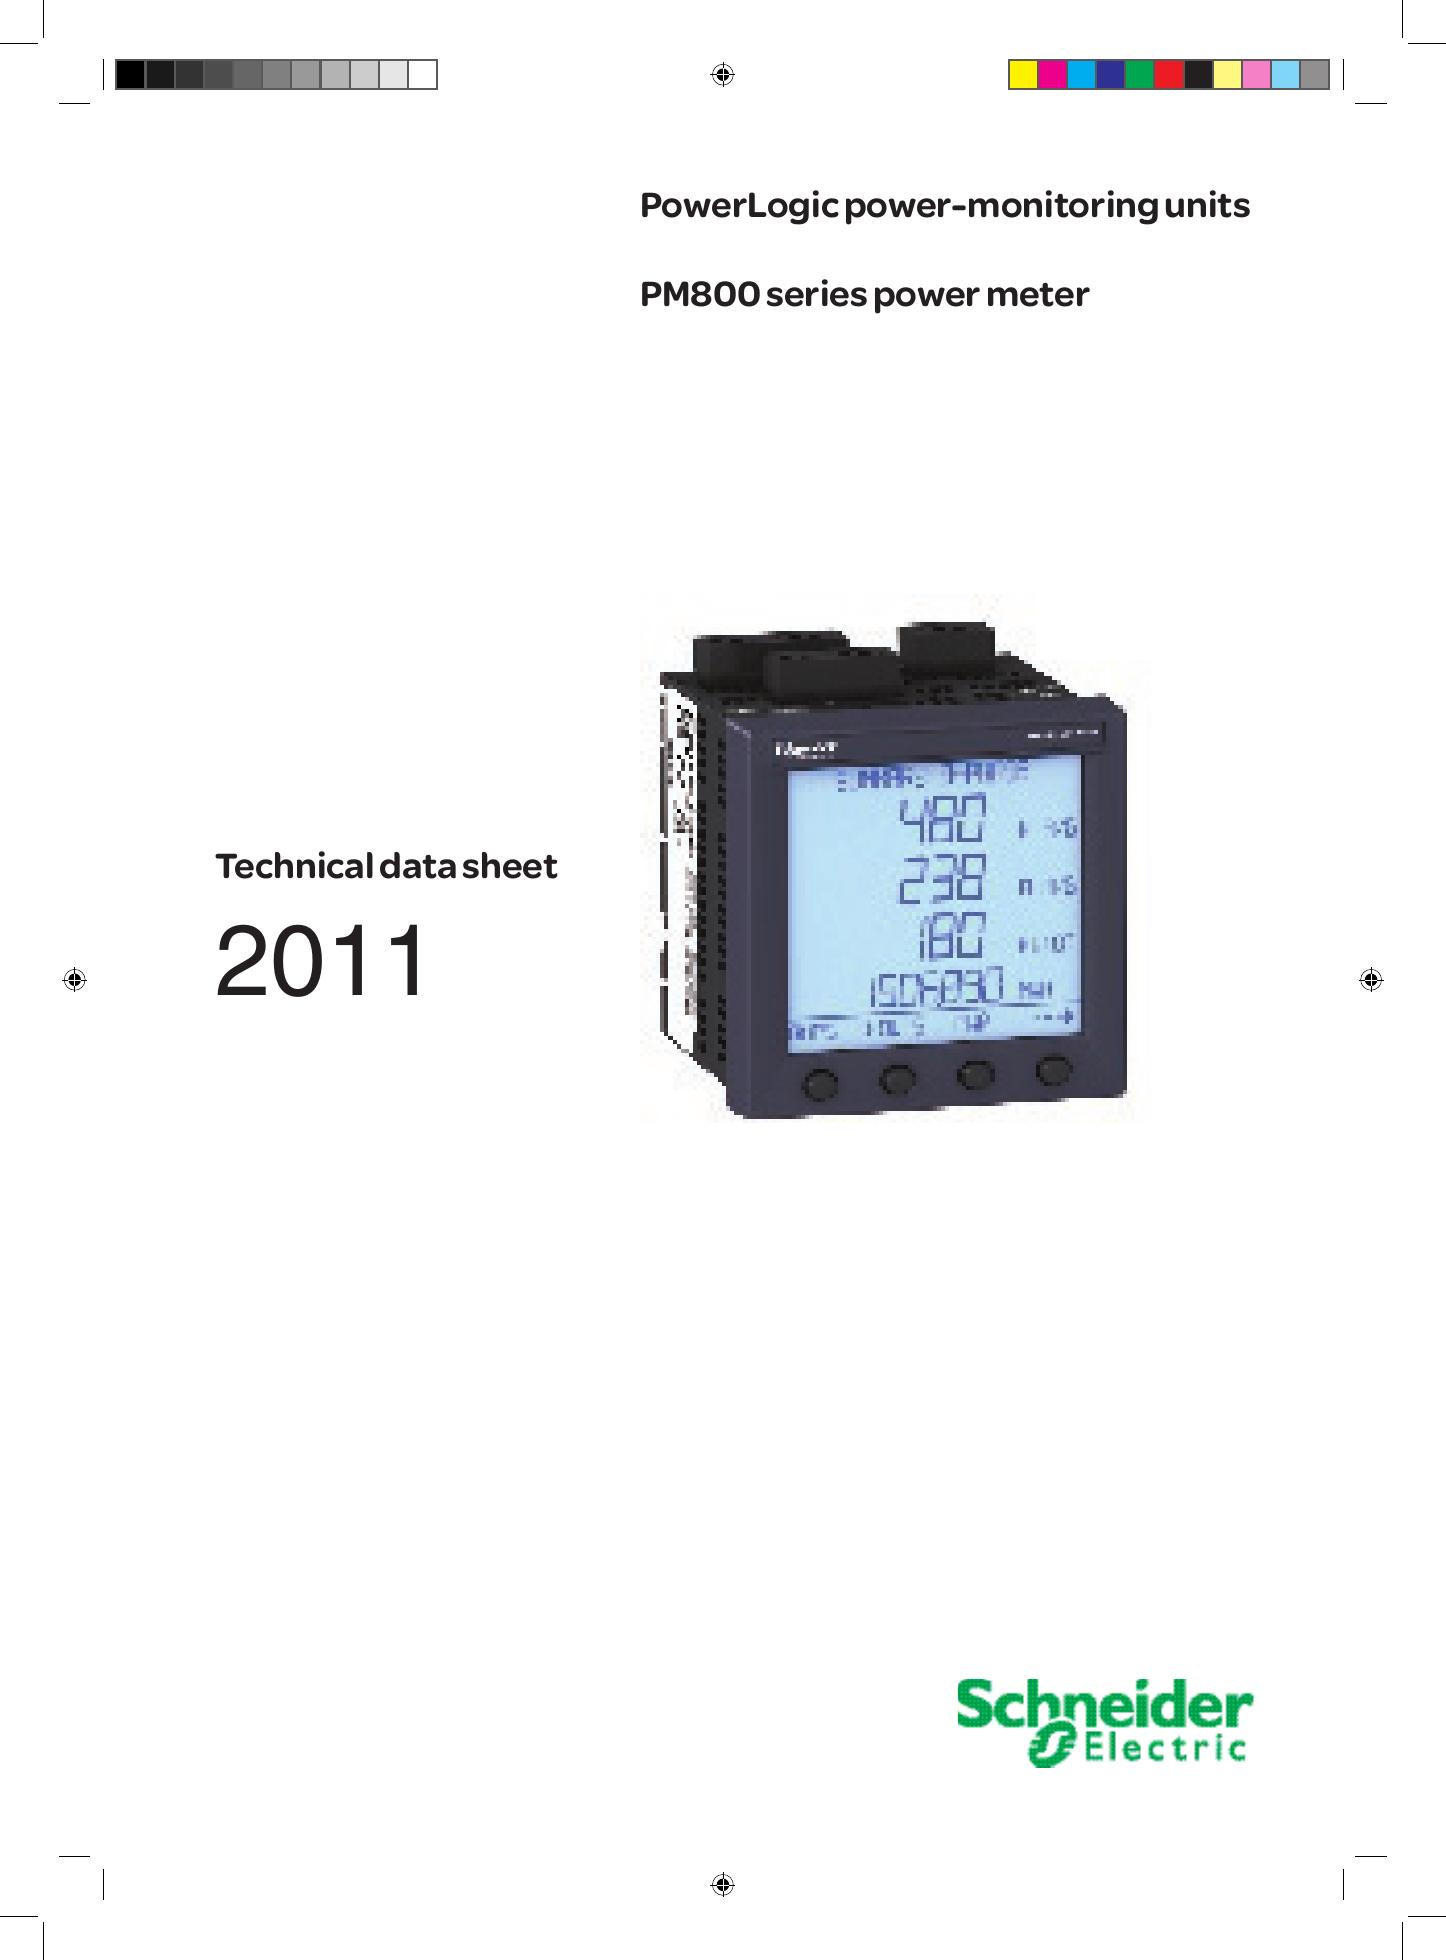 PM850MG Schneider Electric Powerlogic PM800 Power Meter